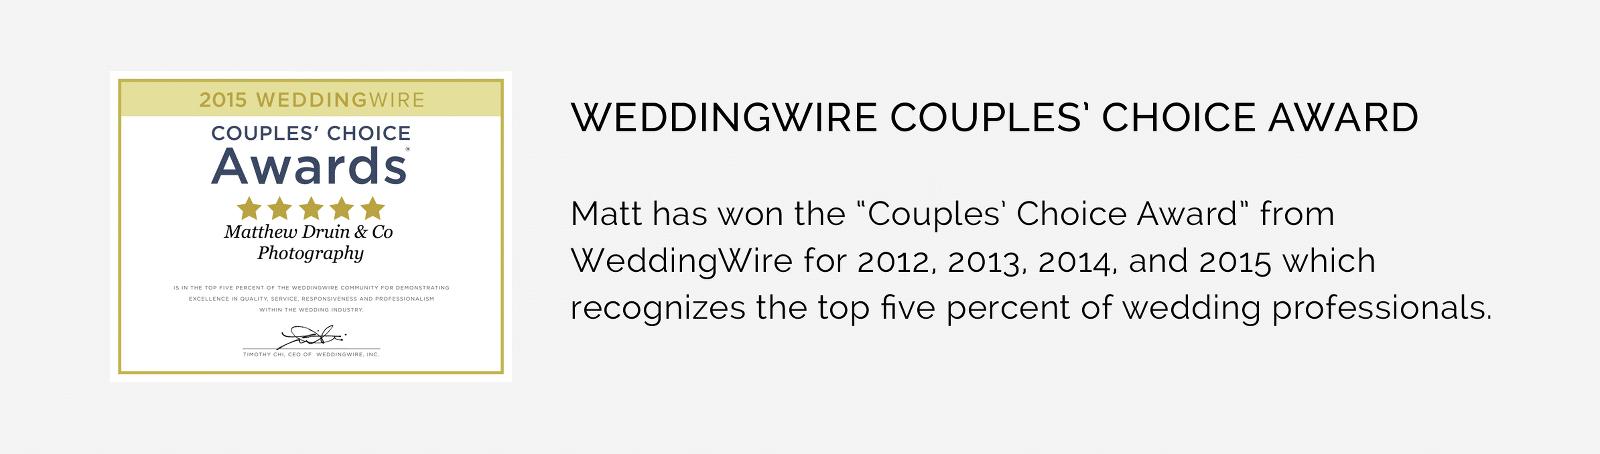 Award winning Wedding Photographers Matthew Druin + Co WeddingWire Award Winner